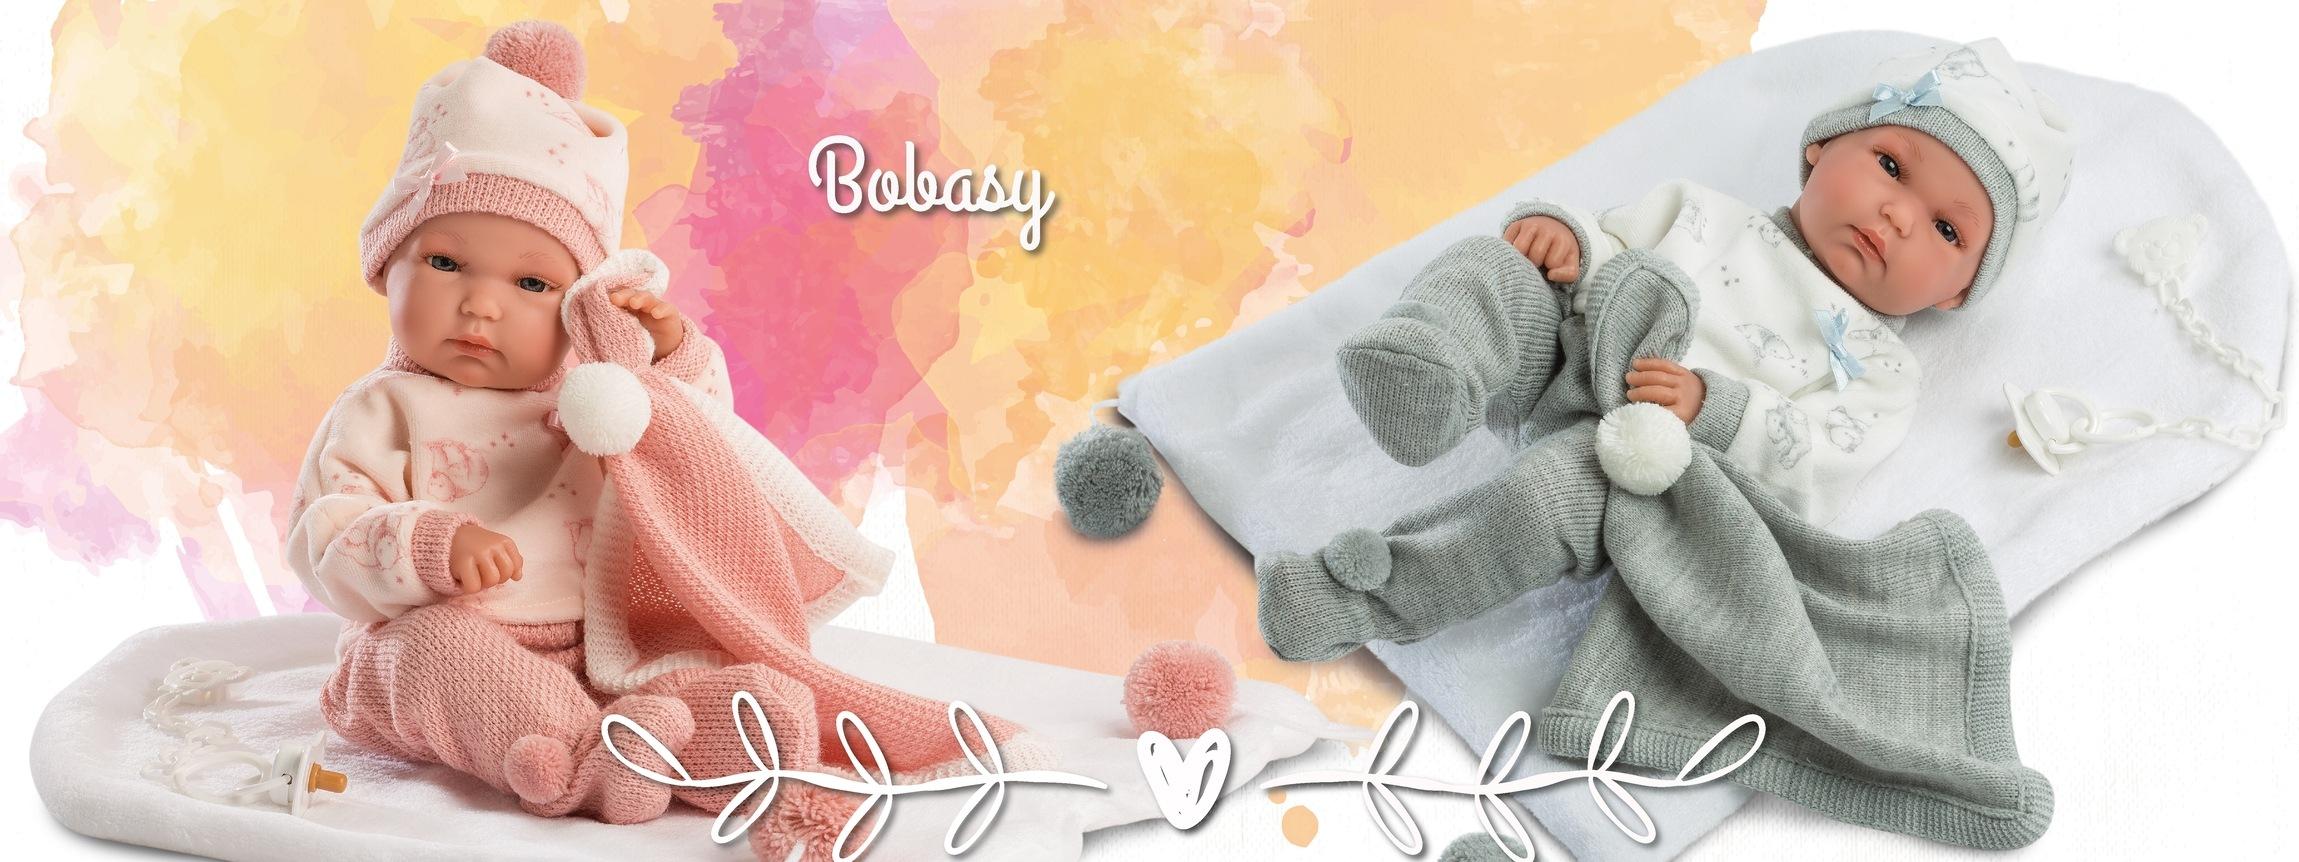 Bobasy